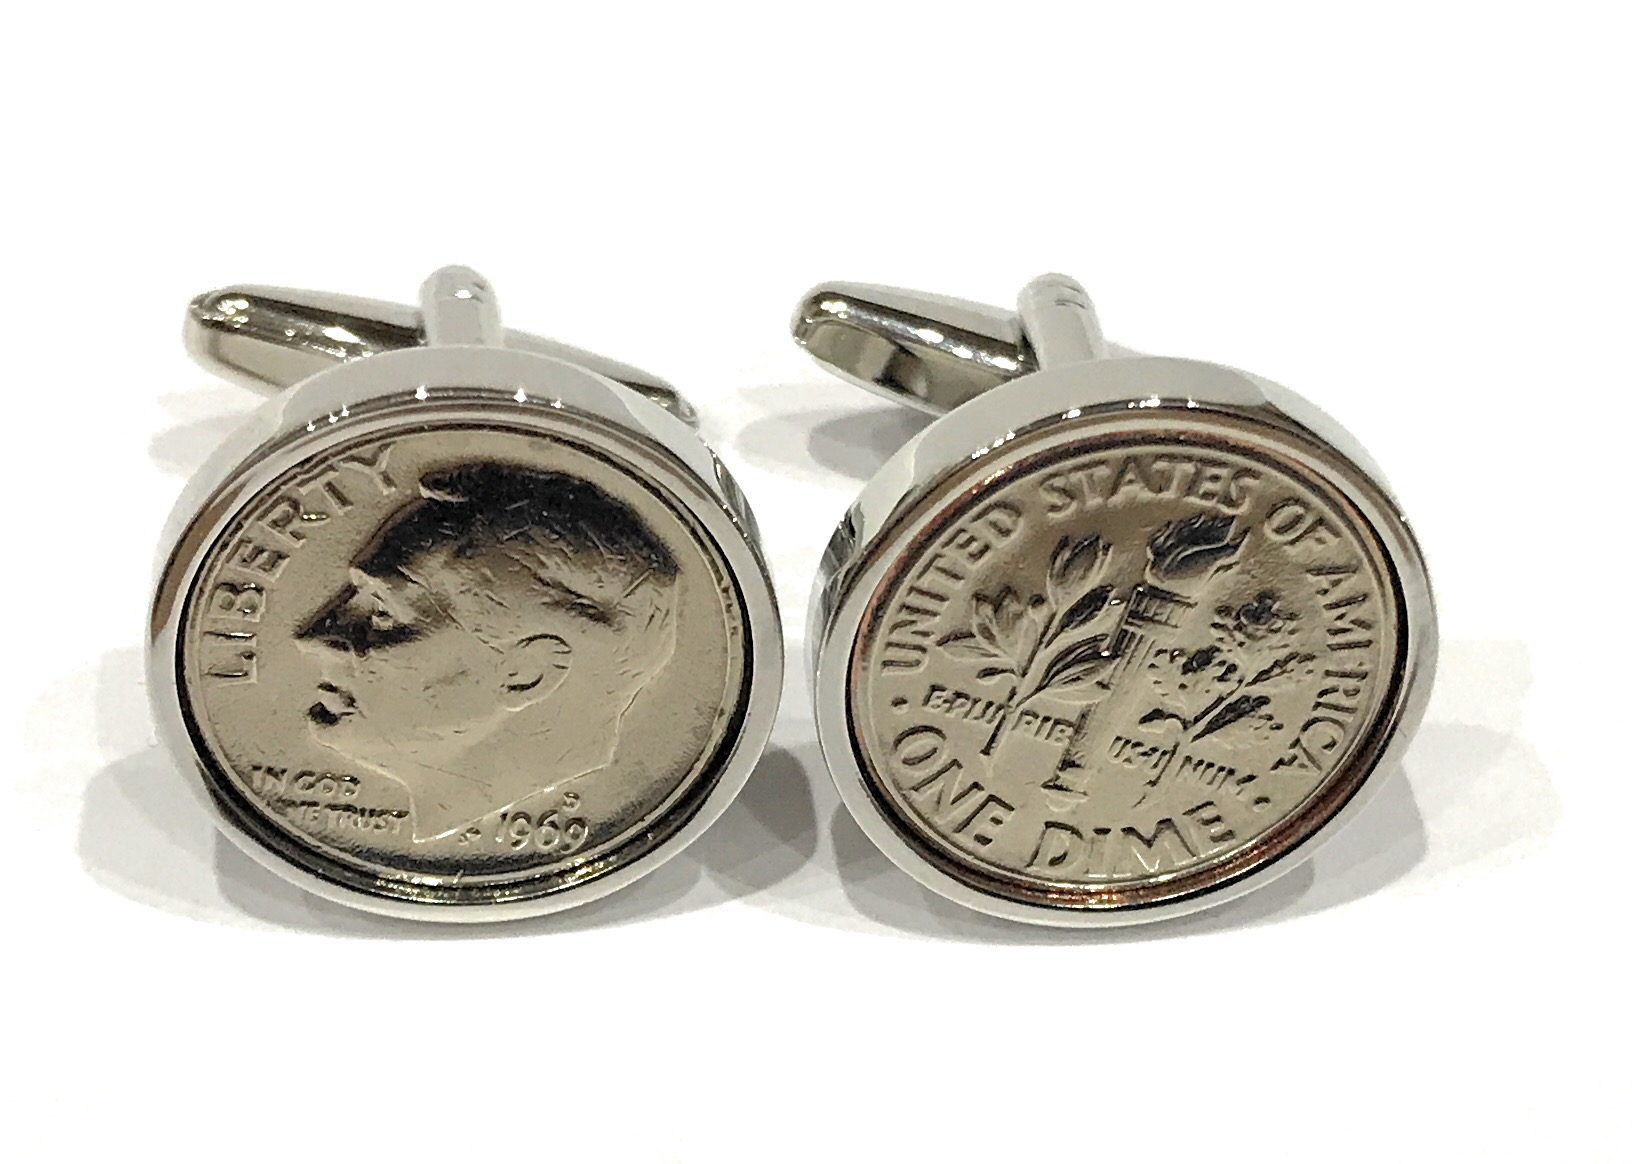 10th Tin Wedding Anniversary 2010 American dime coin cufflinks - Great Gift  USA